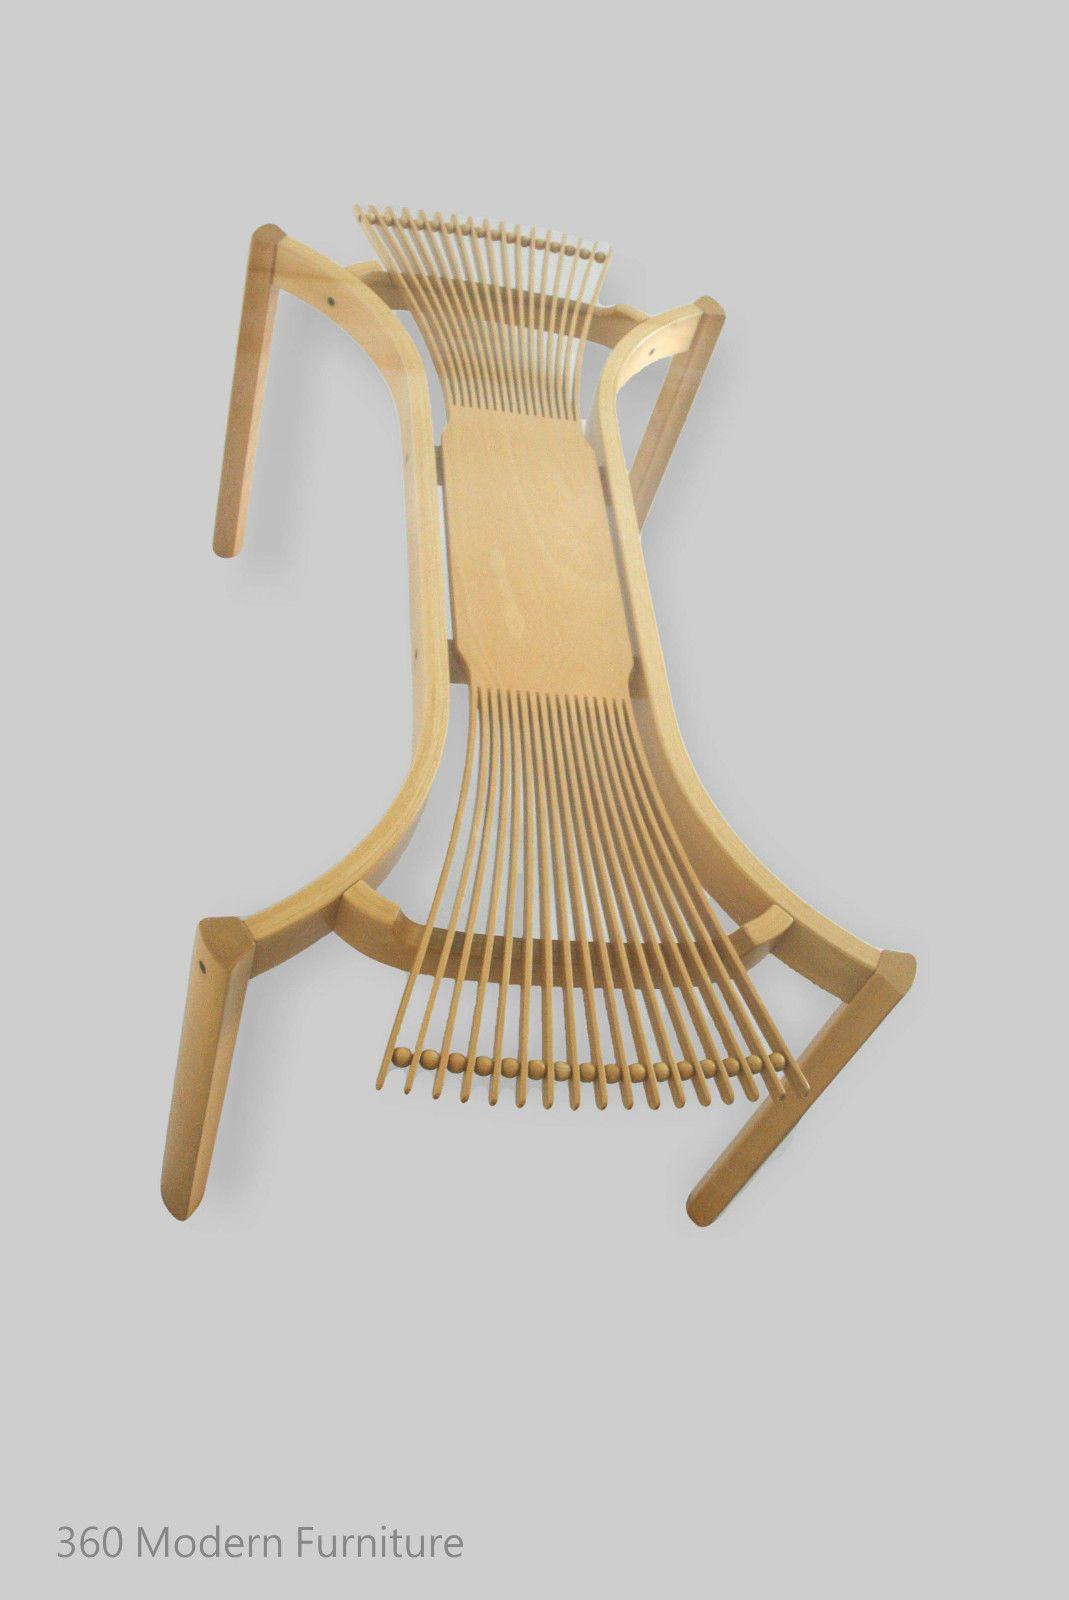 Rare Dining Table 6 Dining Chairs Totem 20th Century Vintage Retro Danish Era Mid Century Furniture Regency Furniture Furniture